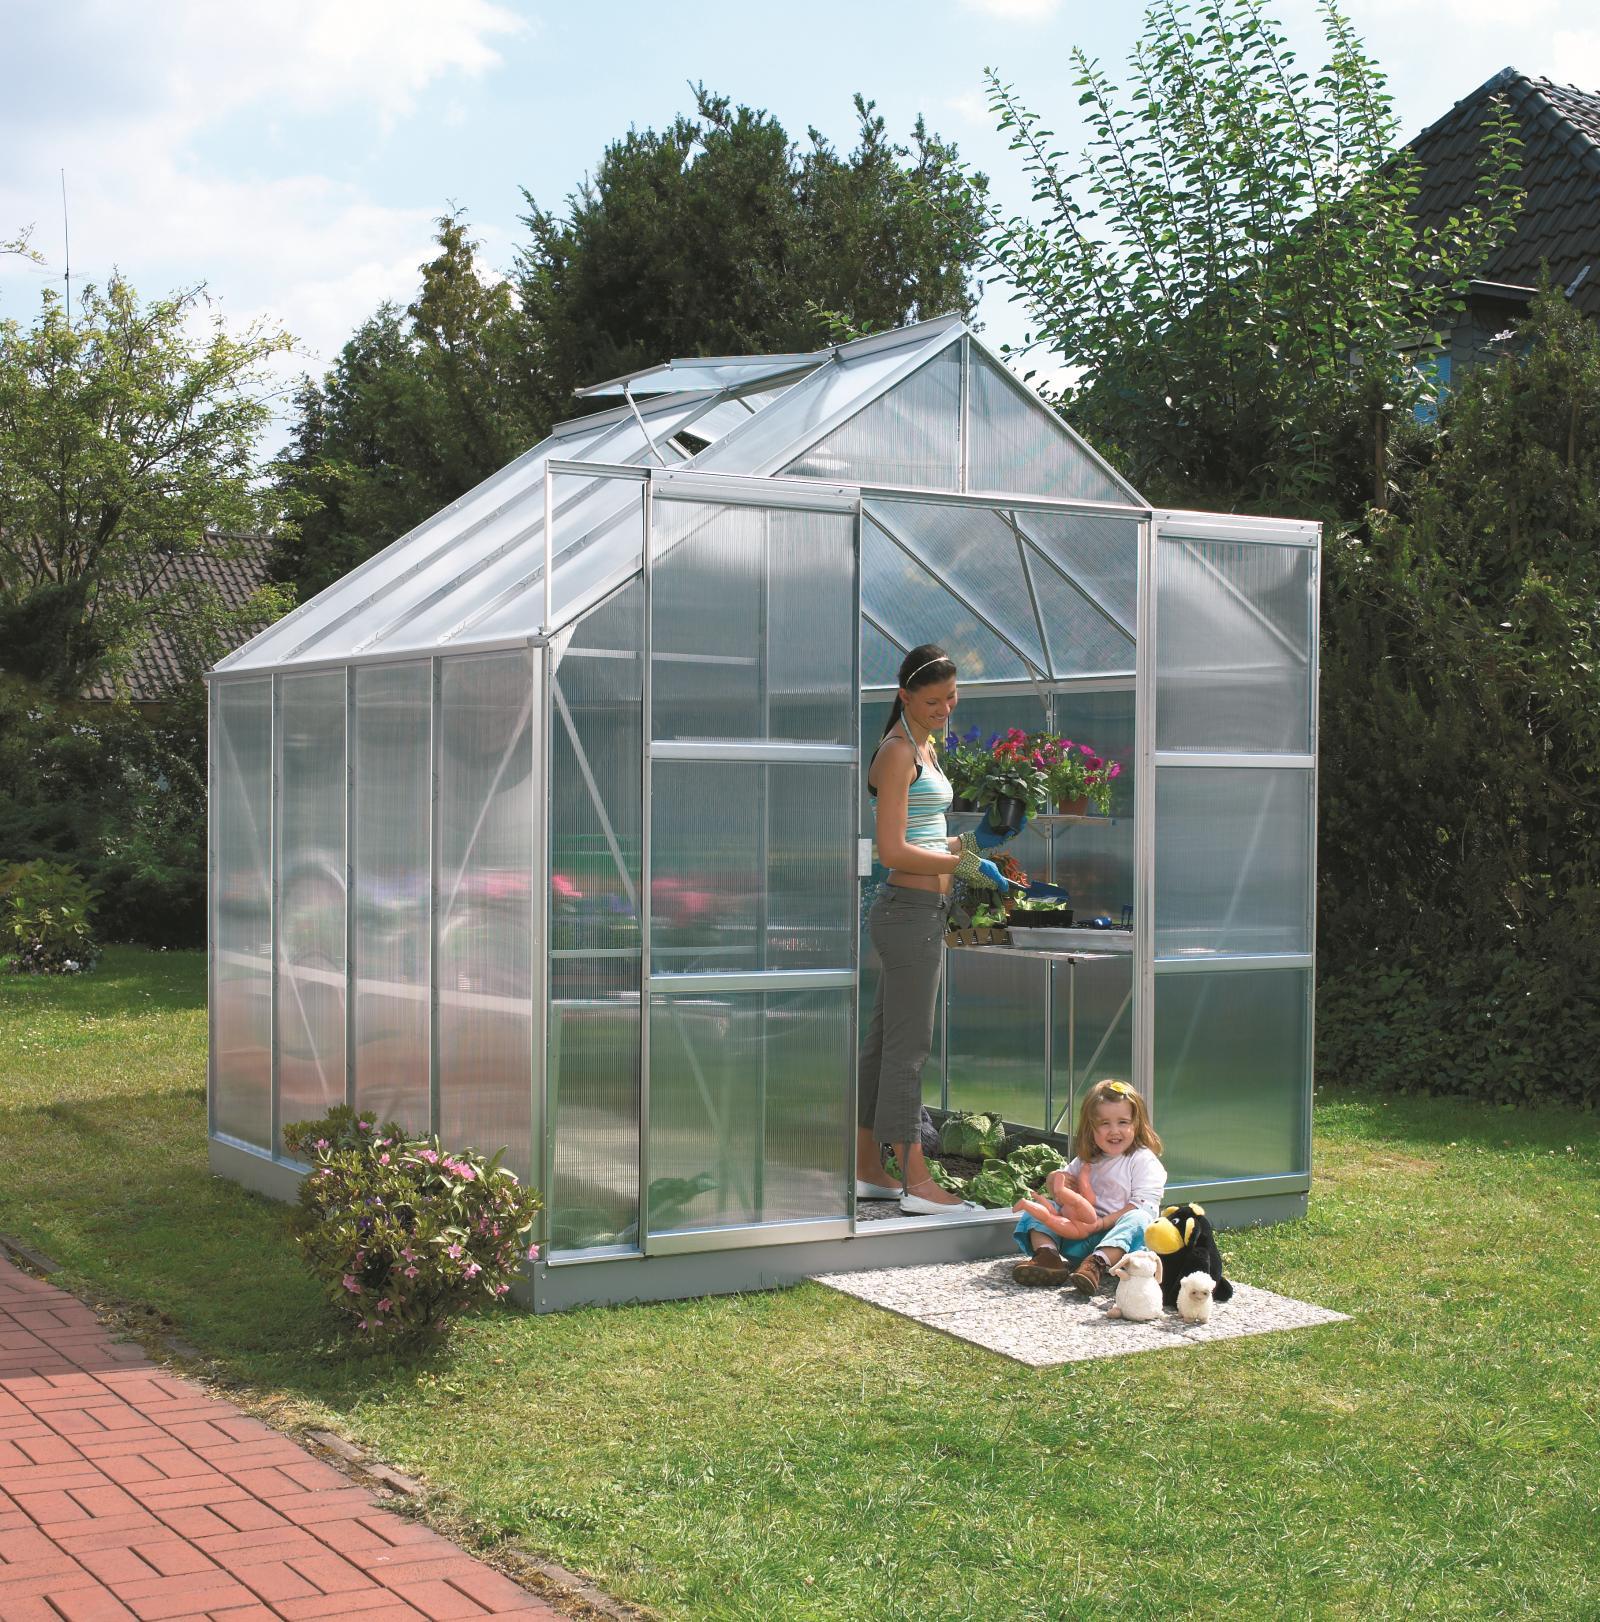 skleník VITAVIA URANUS 6700 PC 6 mm stříbrný